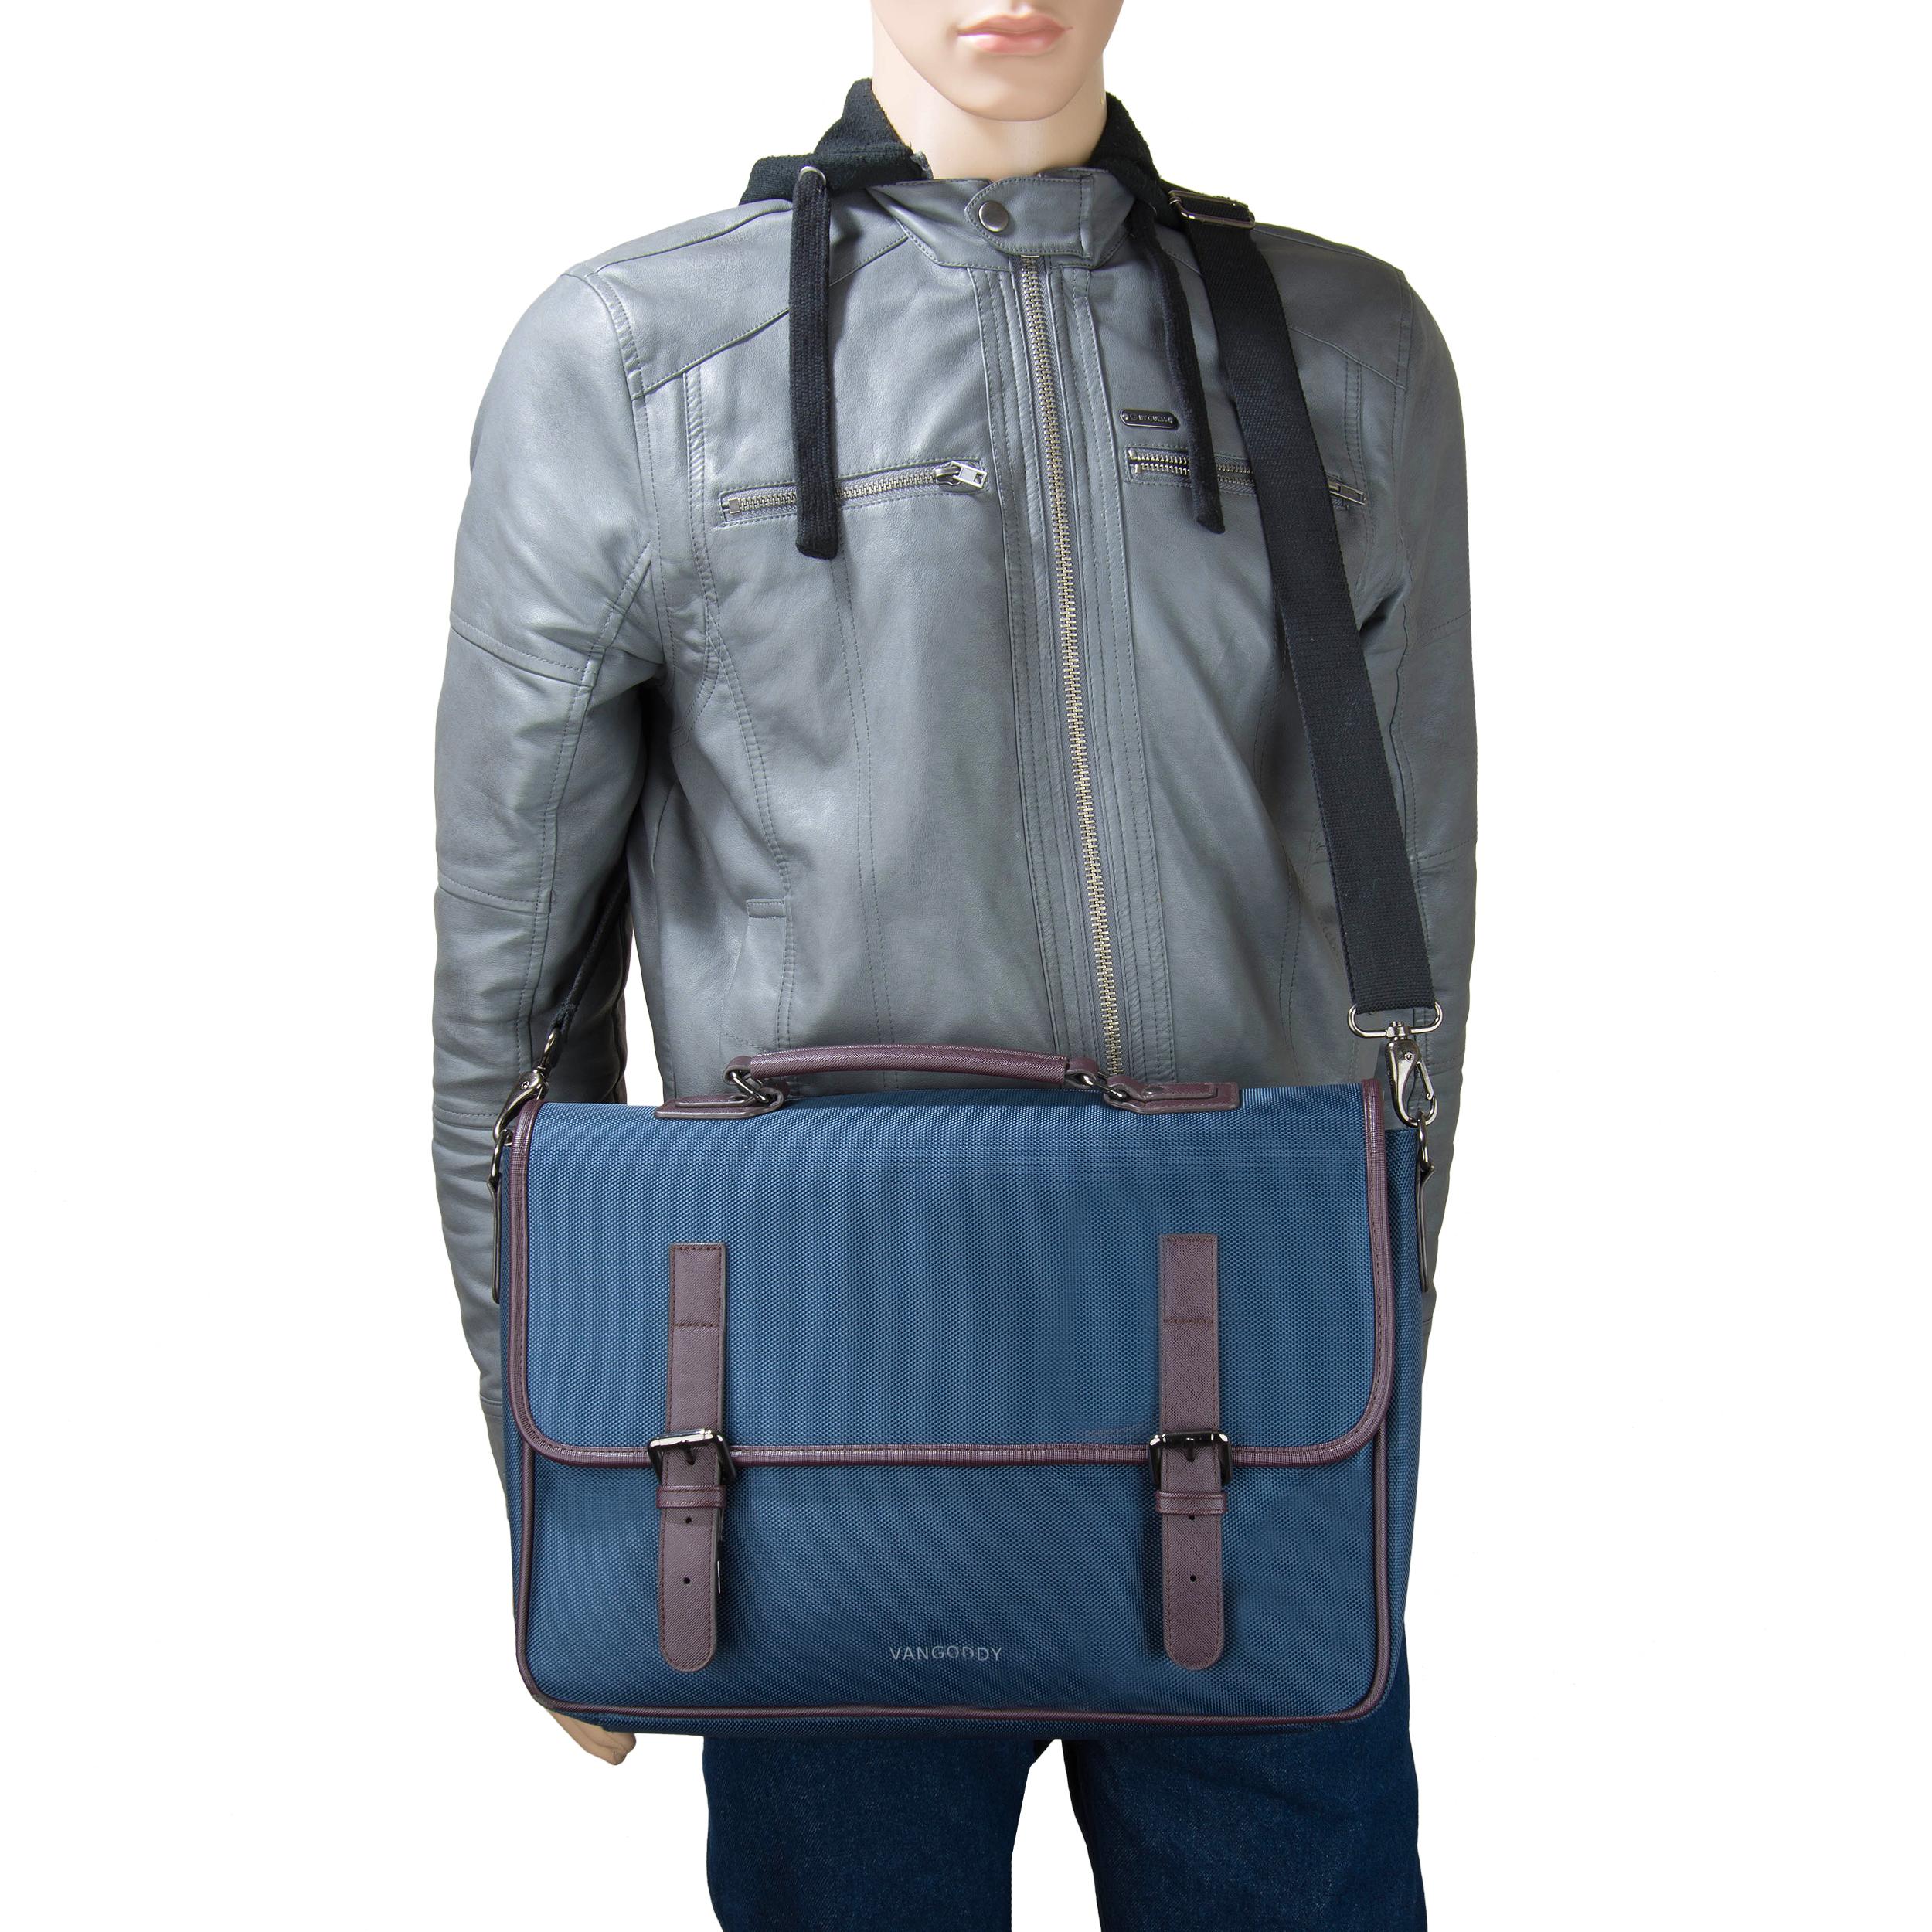 Vangoddy Bodie Laptop Computer Bag Messenger Bag Briefcase